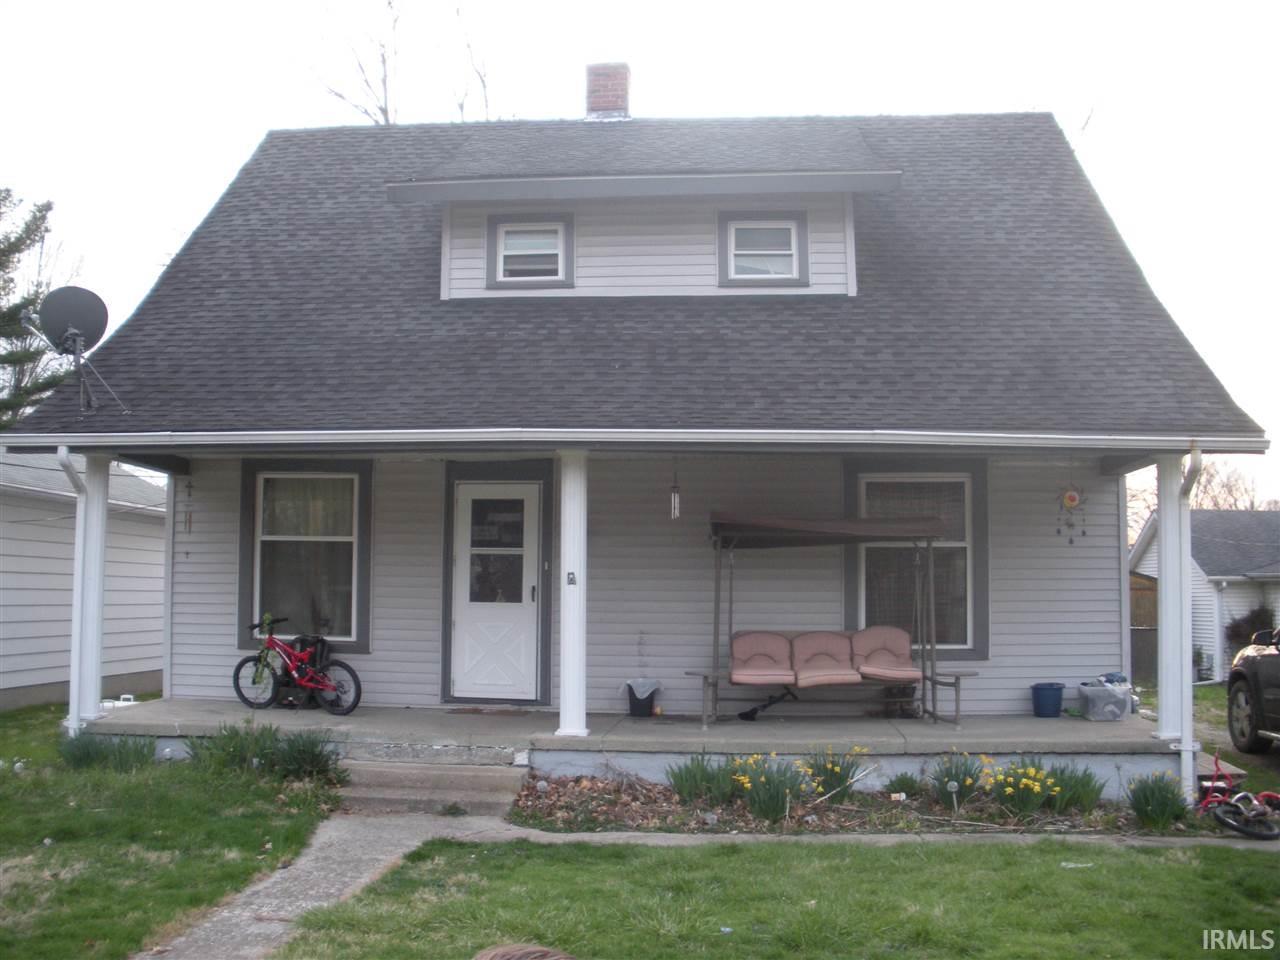 411 Wayne, Crawfordsville, IN 47933